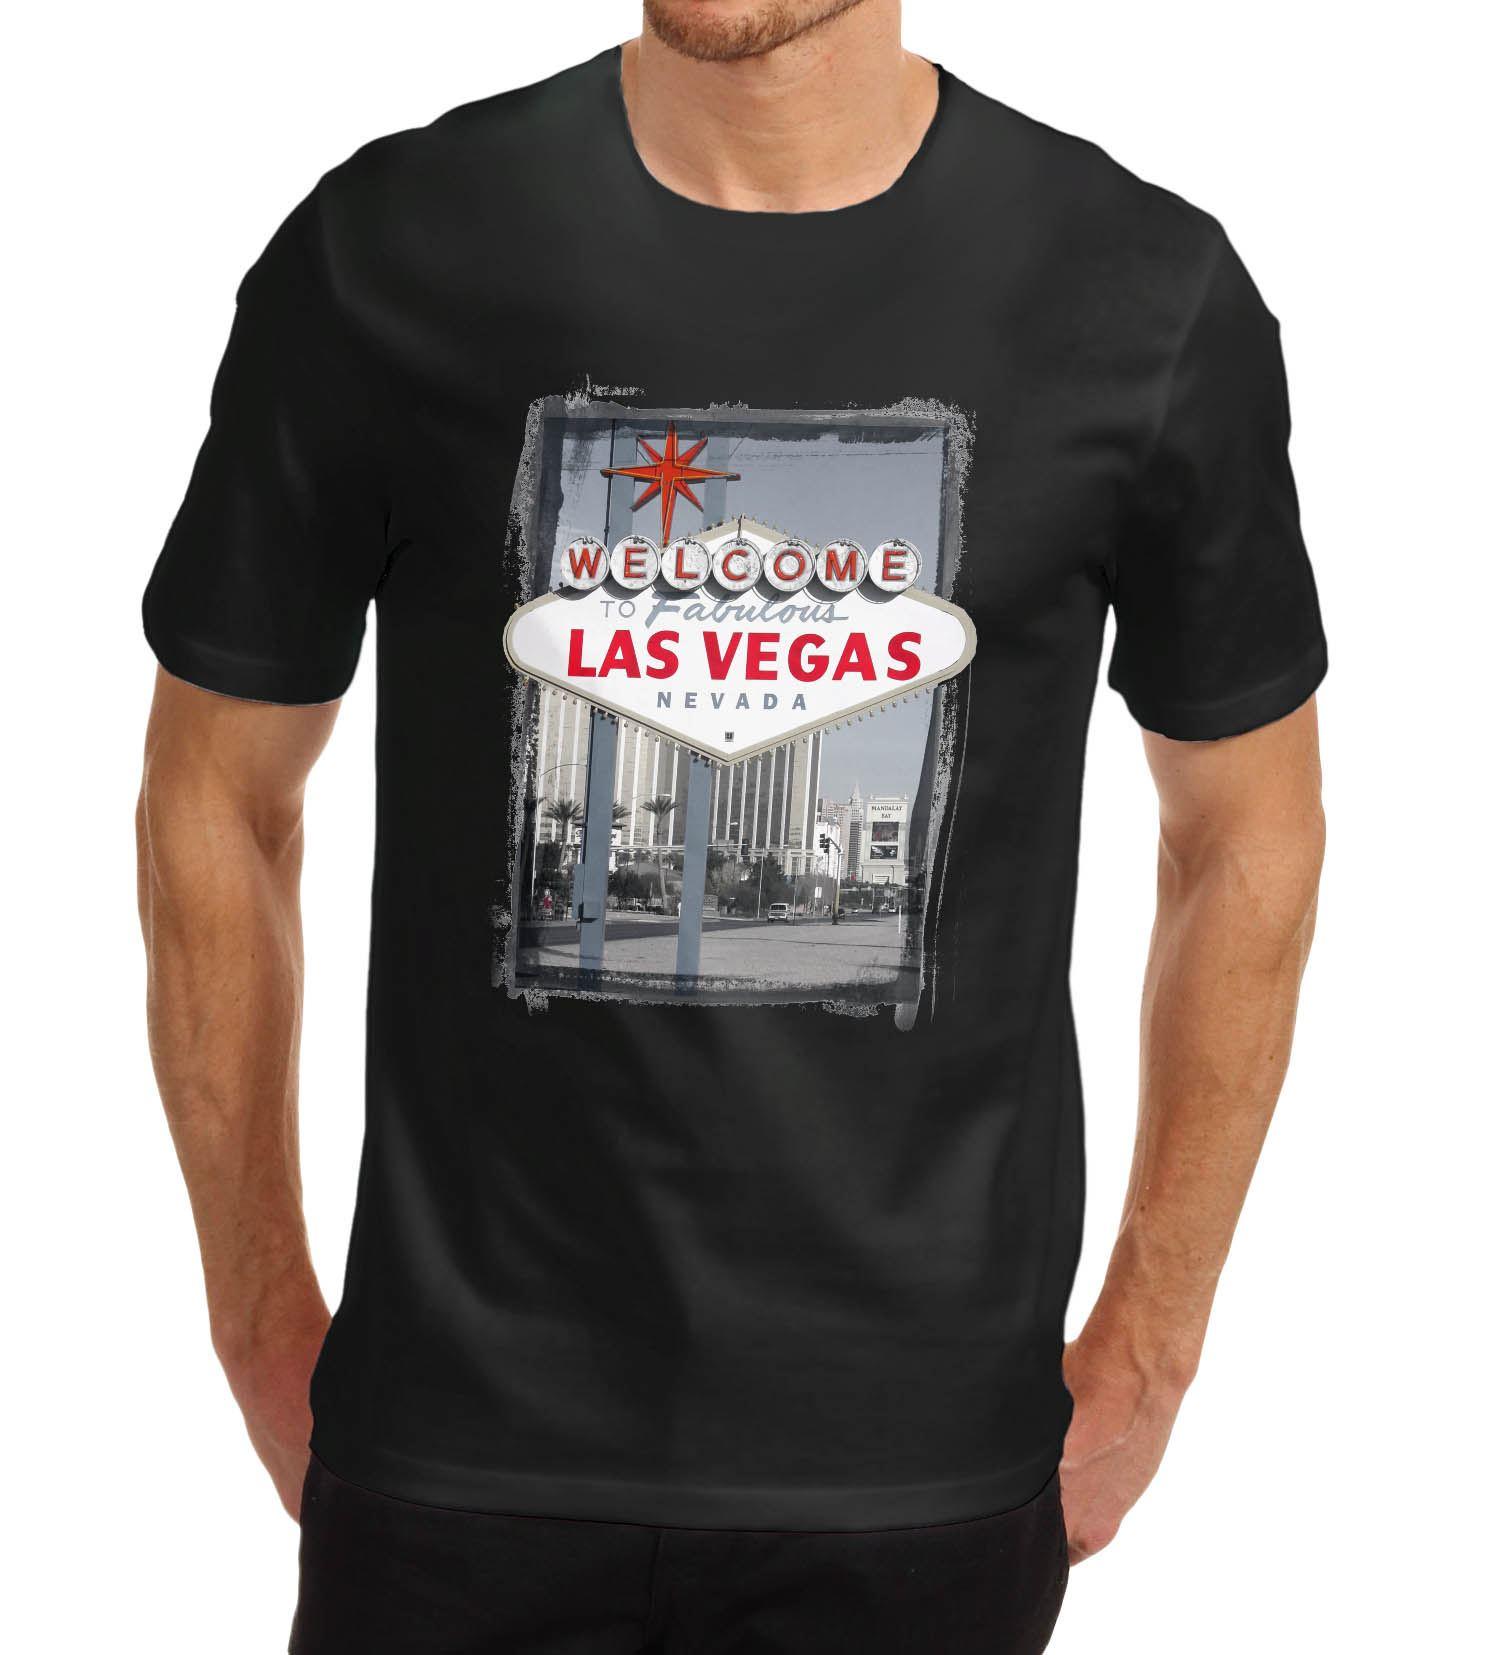 t shirt embroidery las vegas